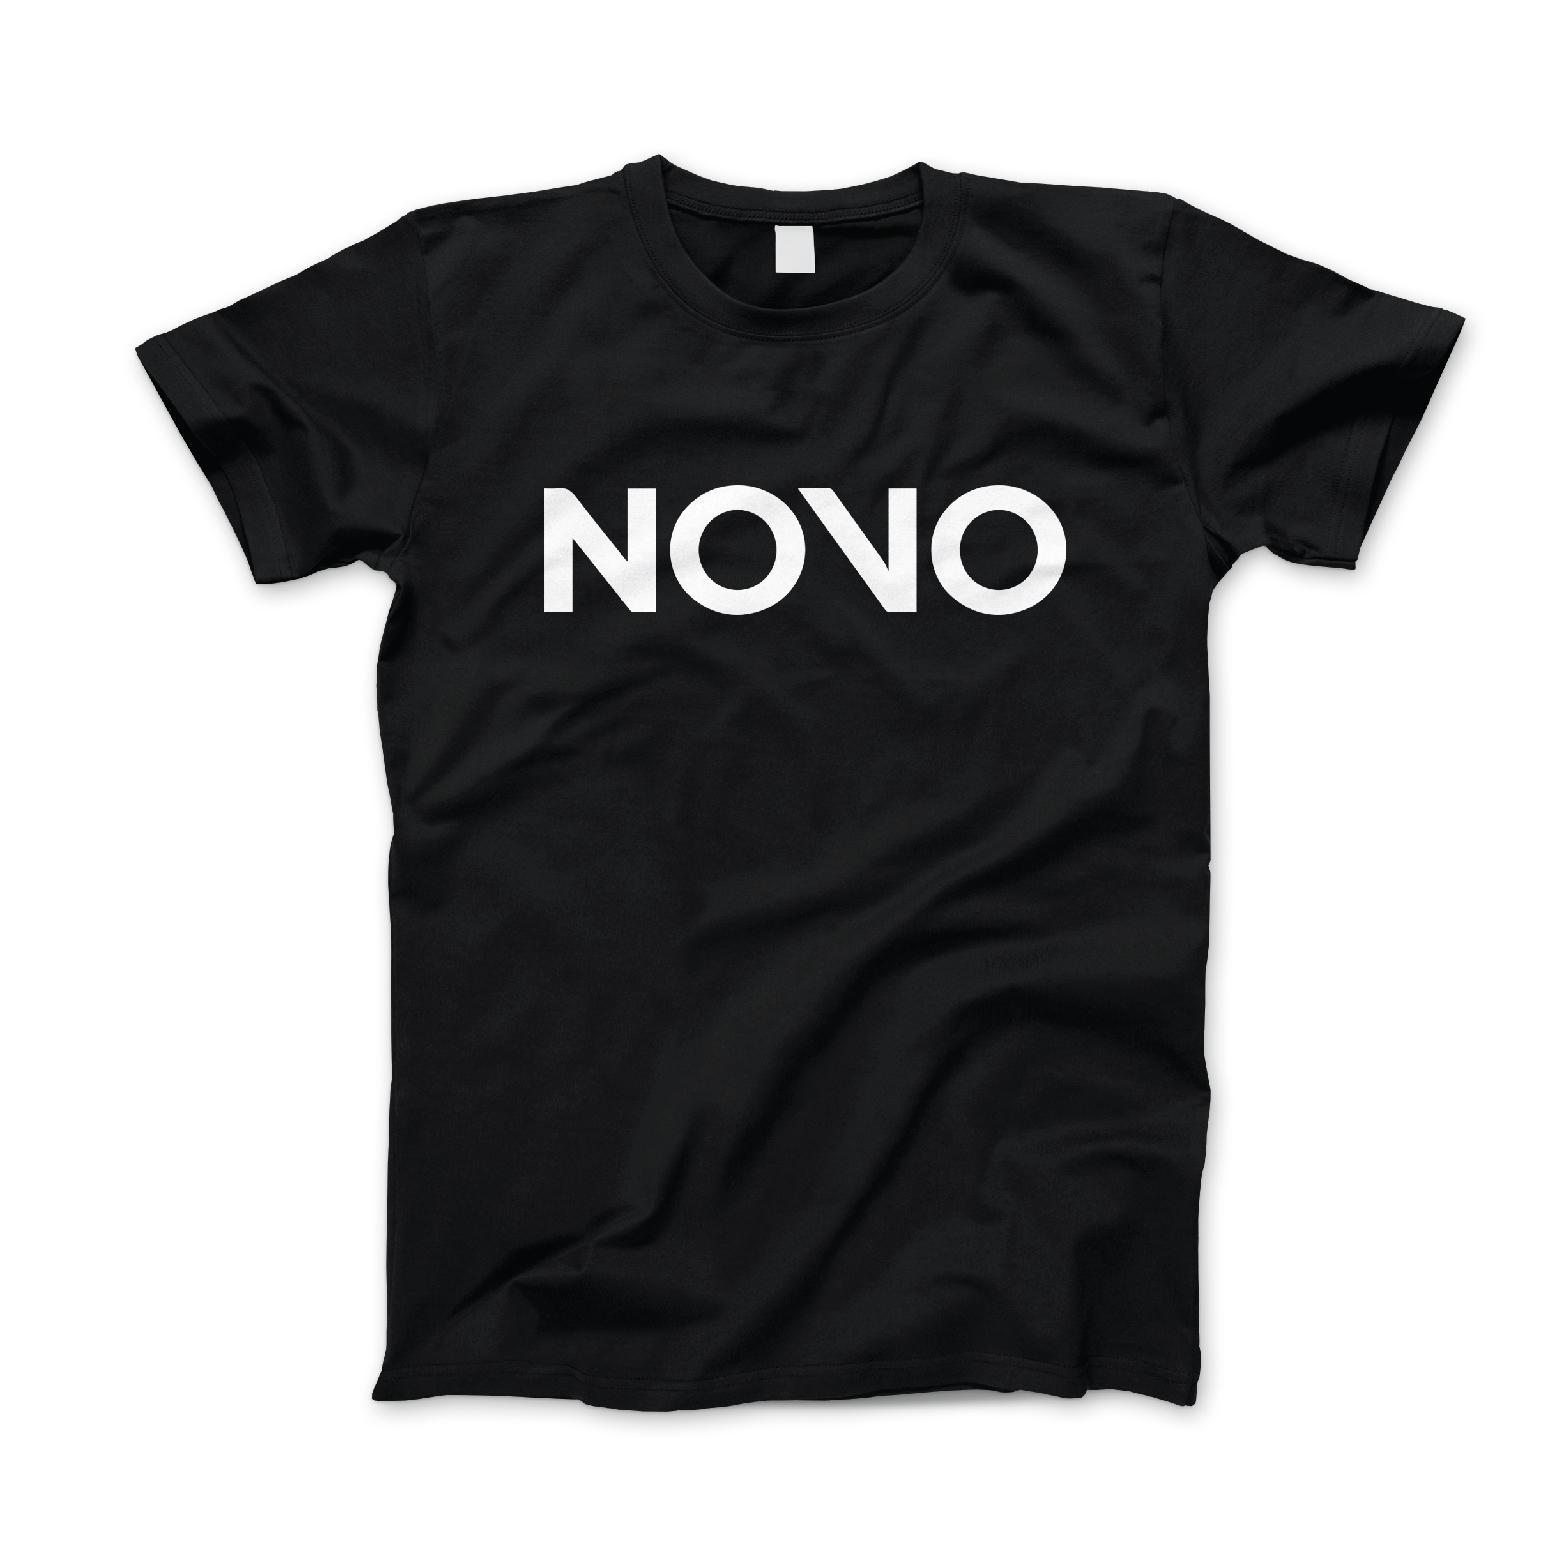 NOVO-Case-Study-Images-03.jpg